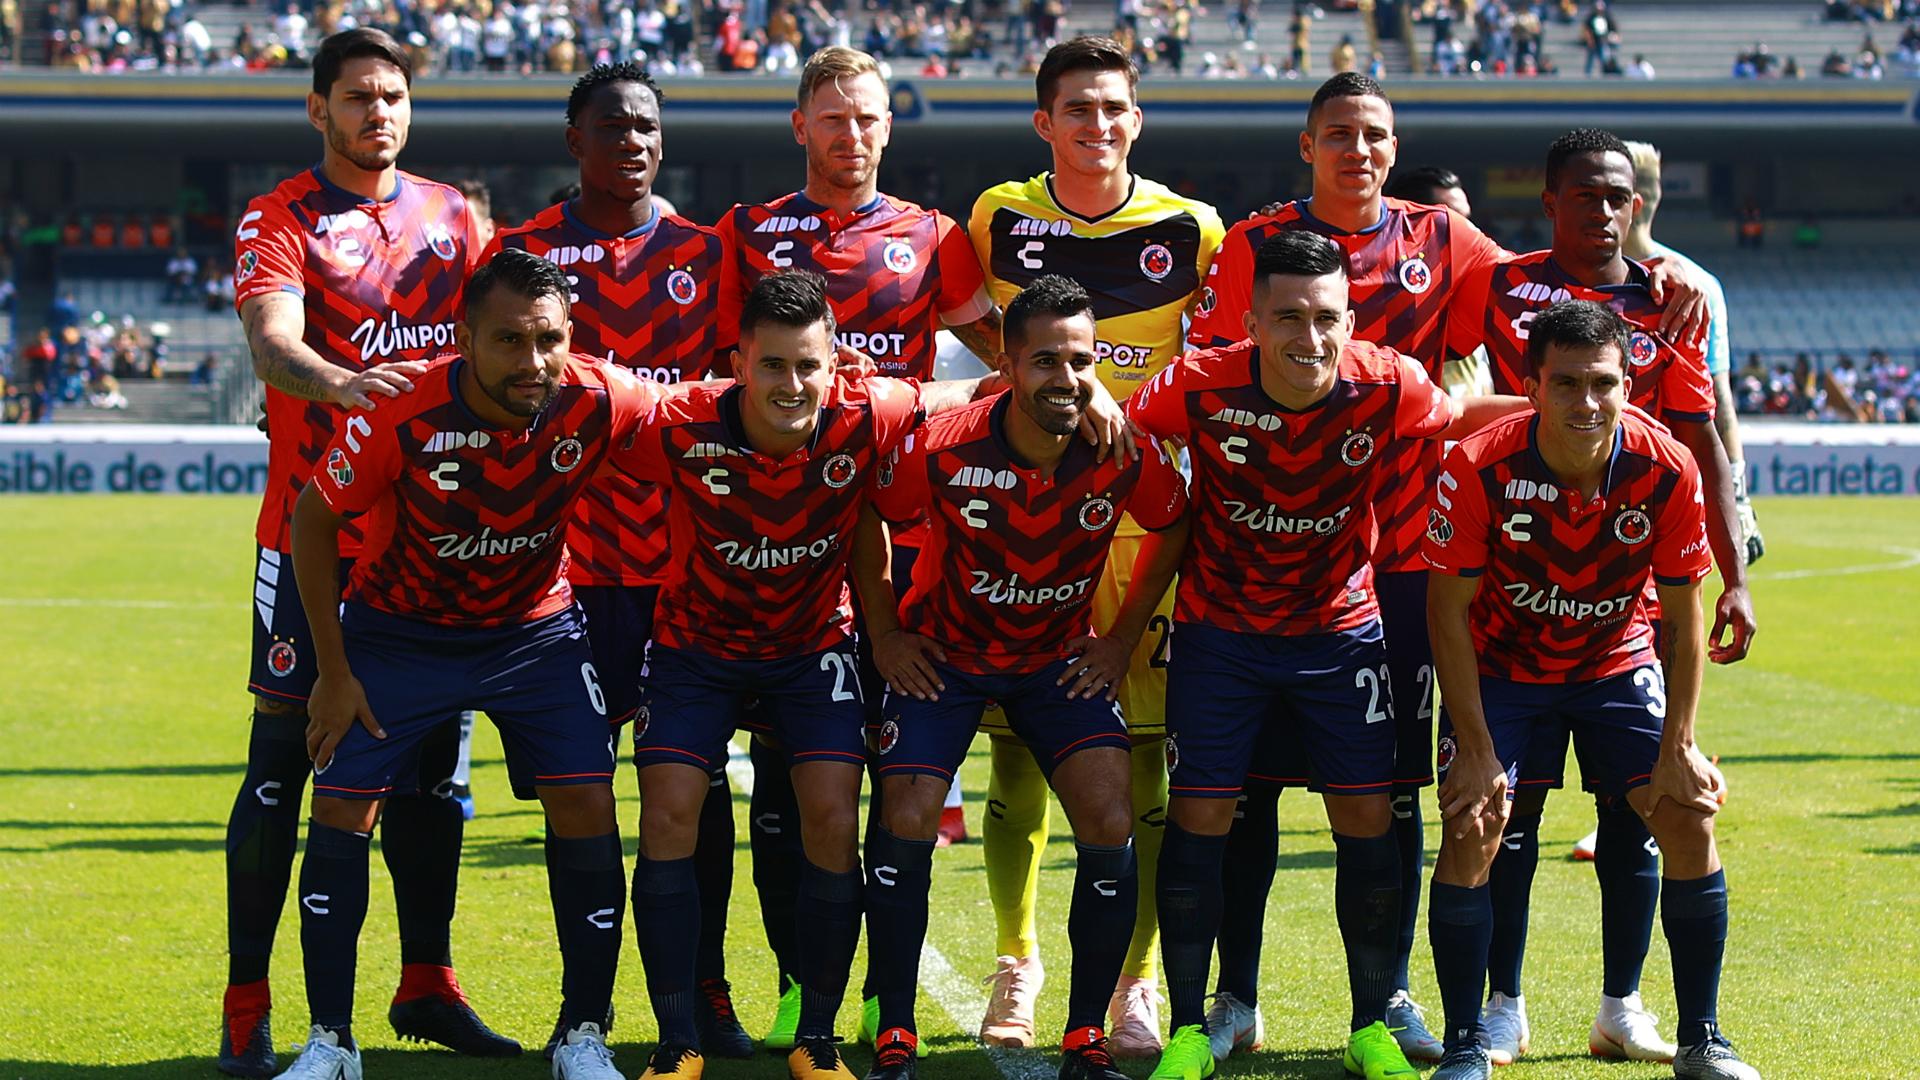 Veracruz Apertura 2019